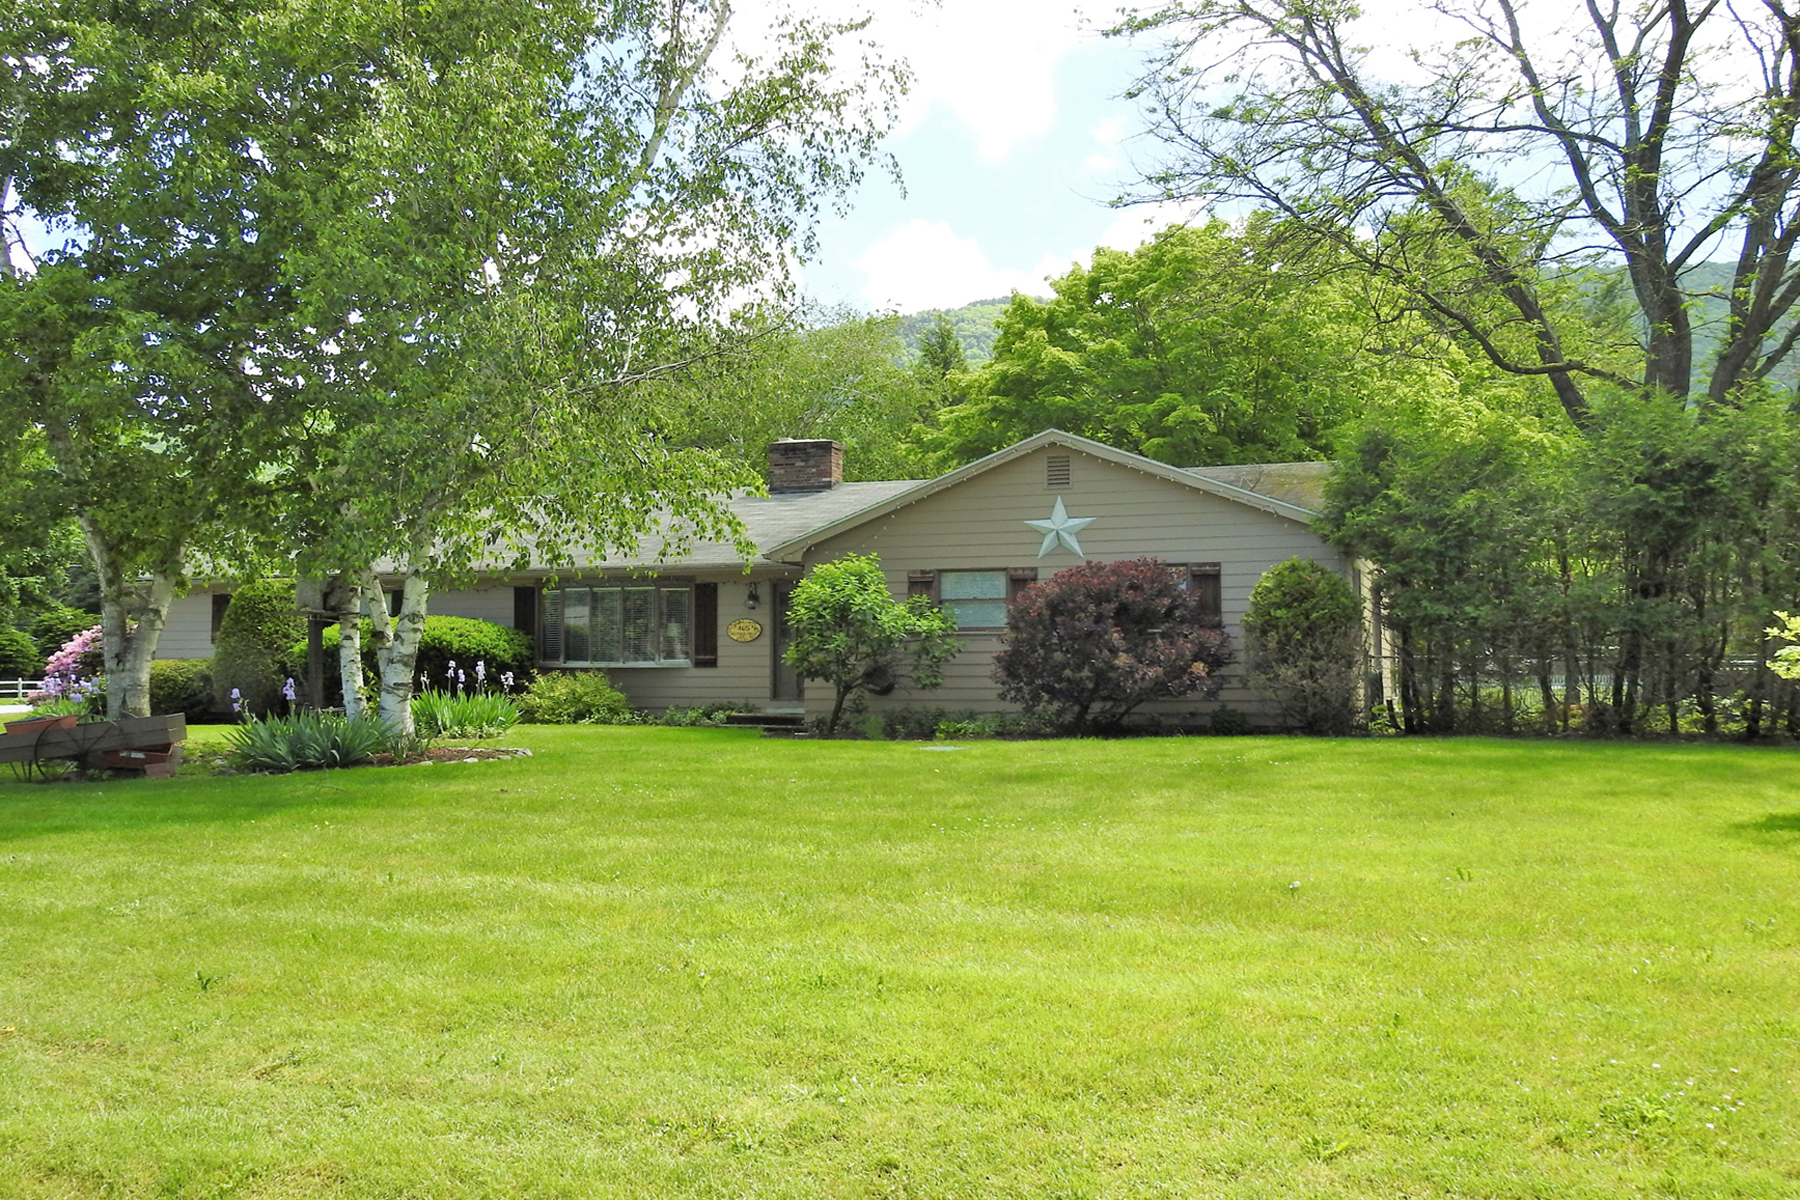 Single Family Homes for Sale at 465 Eastridge Circle, Mendon 465 Eastridge Cir Mendon, Vermont 05701 United States